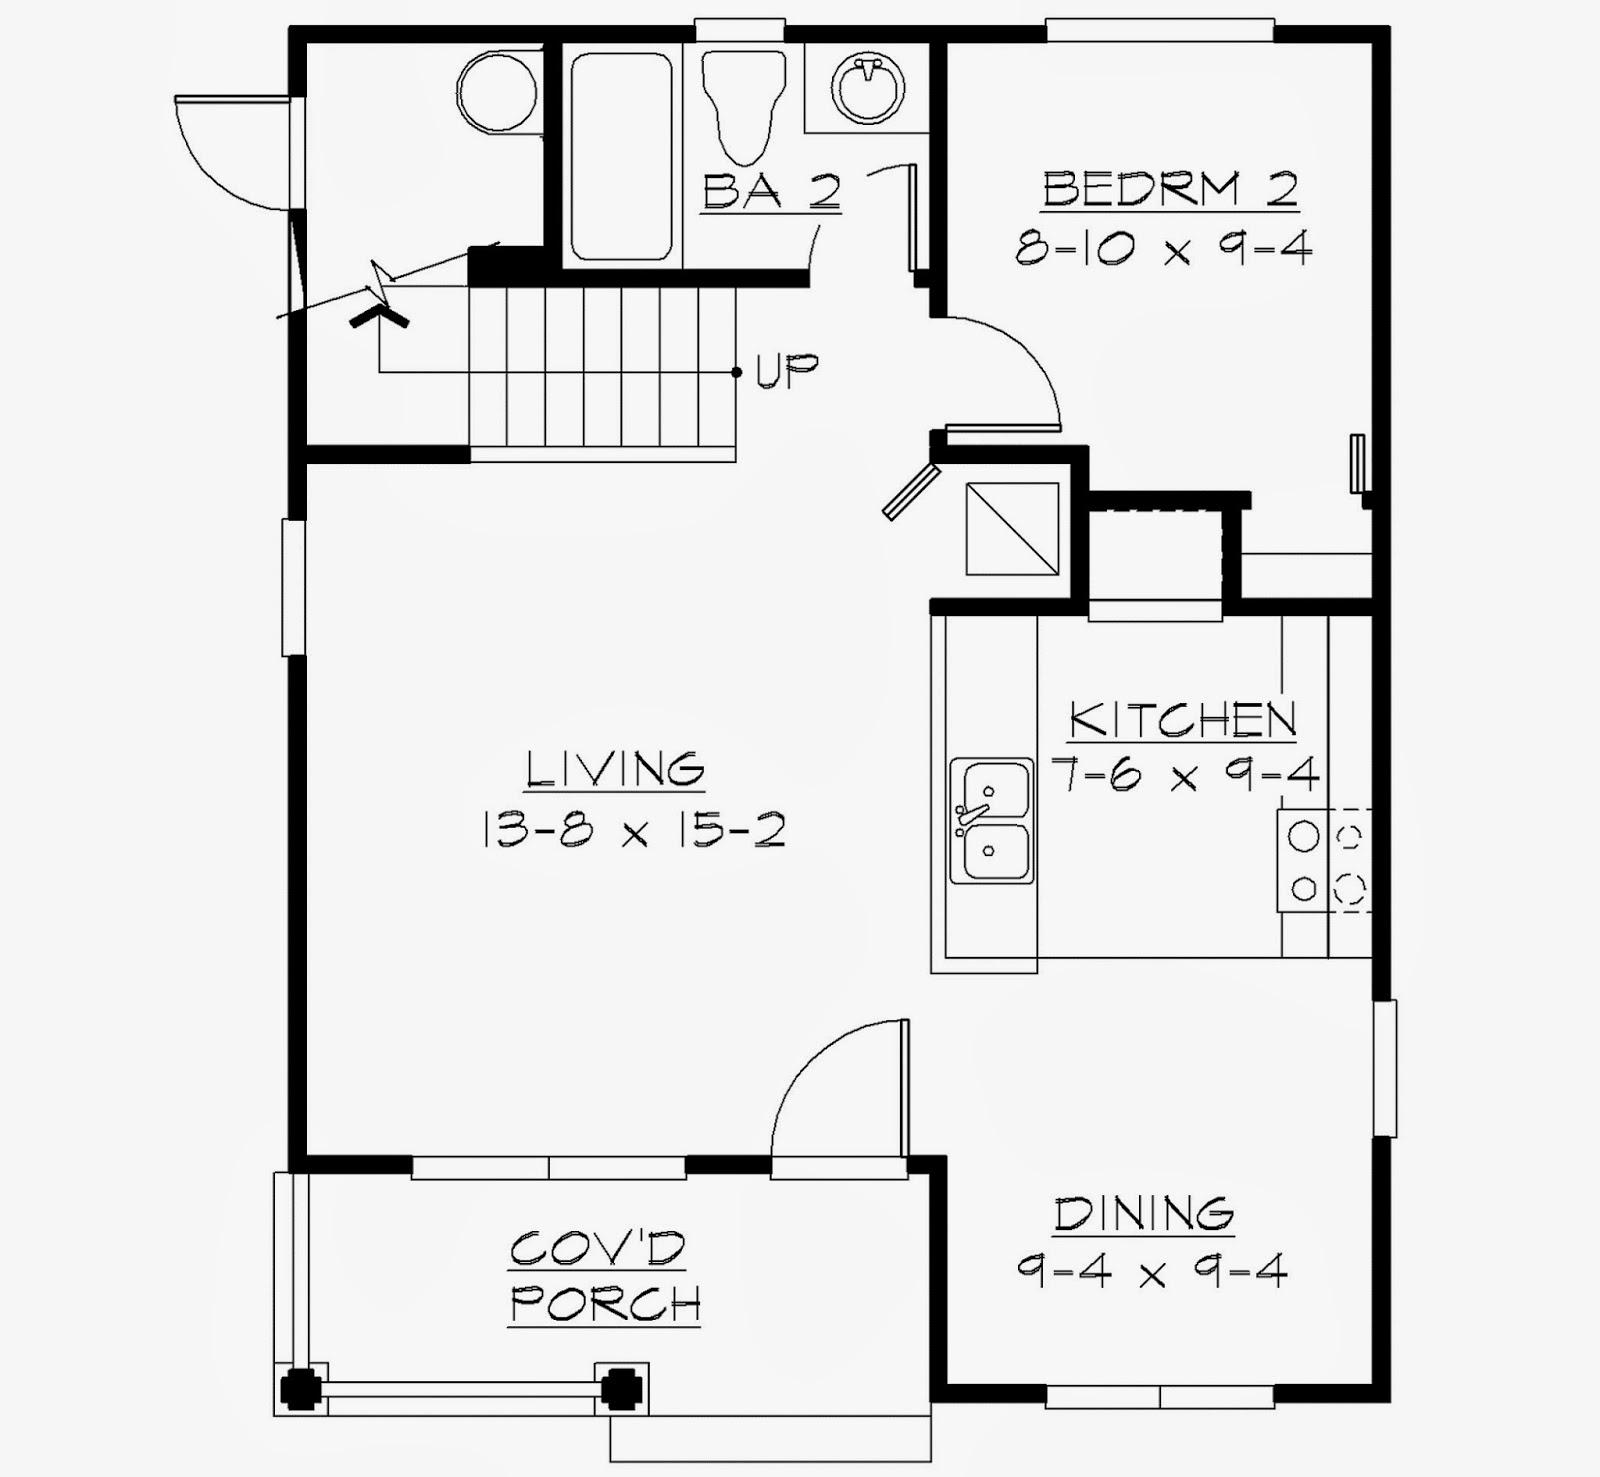 Foundation Dezin & Decor...: Small Home Layout's